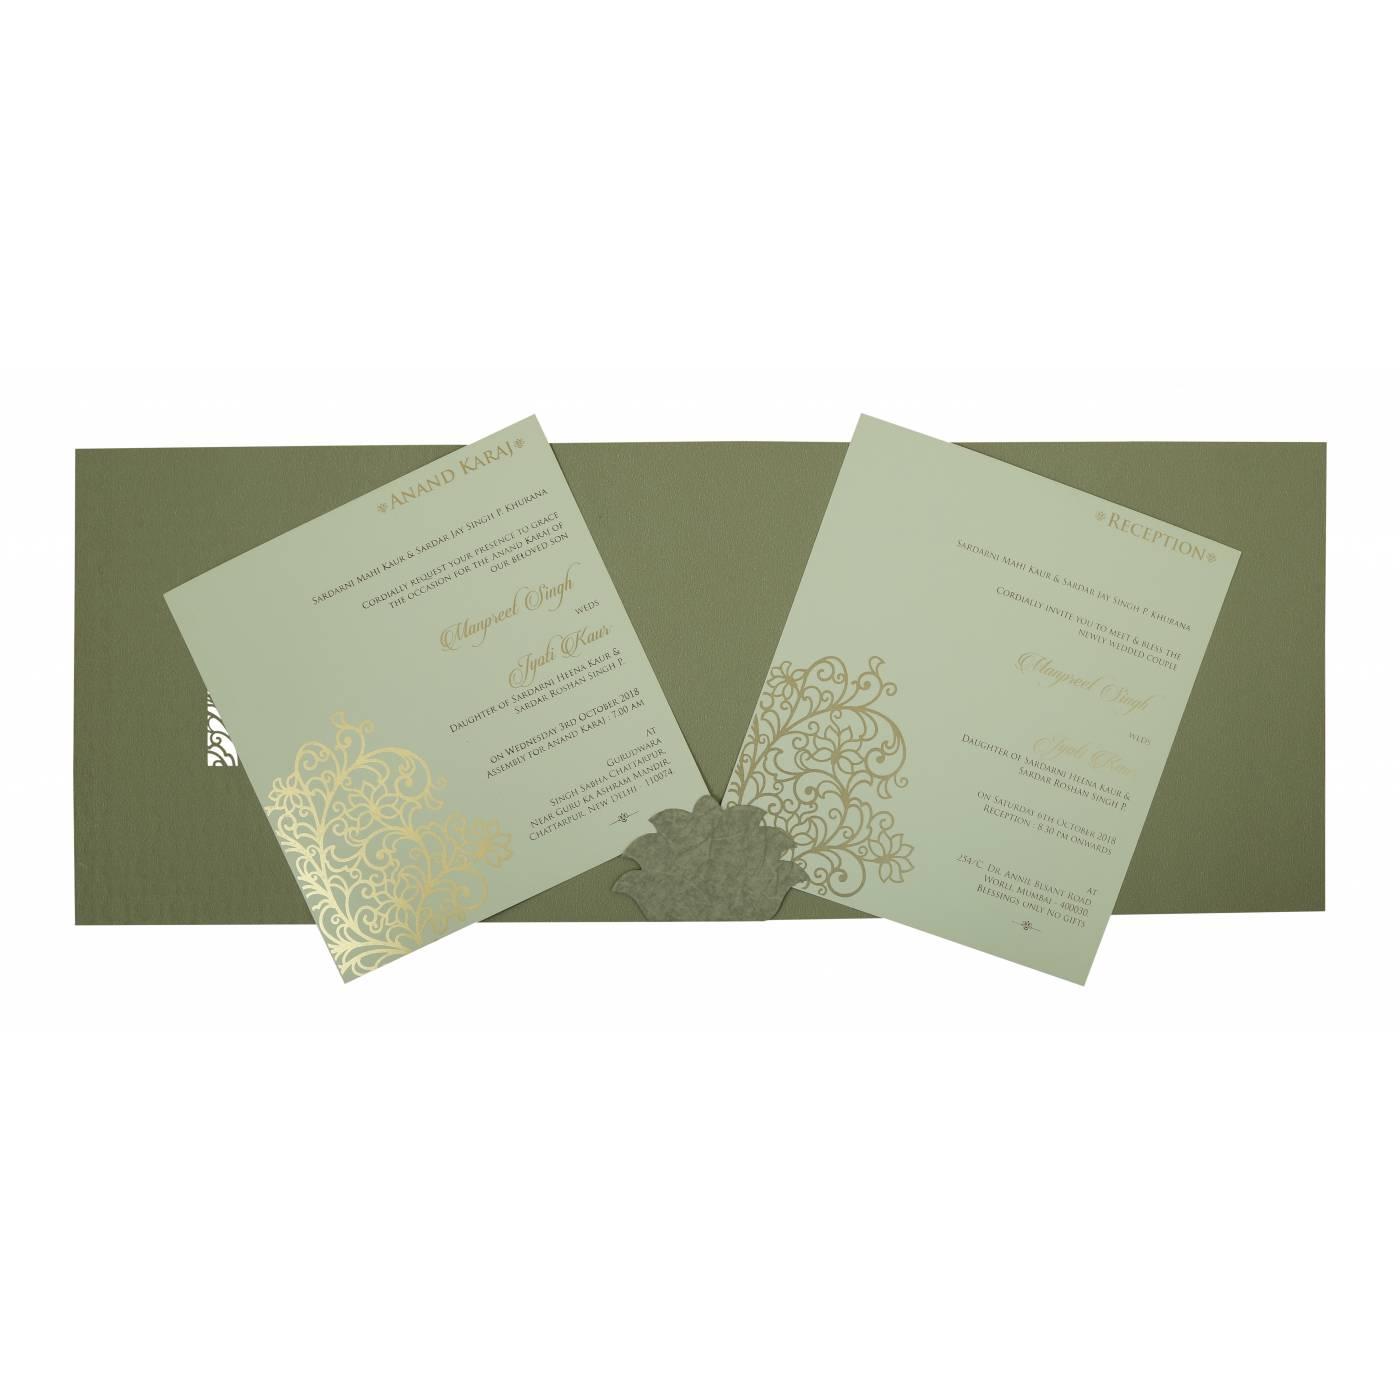 SAGE GREEN MATTE FLORAL THEMED - LASER CUT WEDDING INVITATION : CG-1809 - IndianWeddingCards